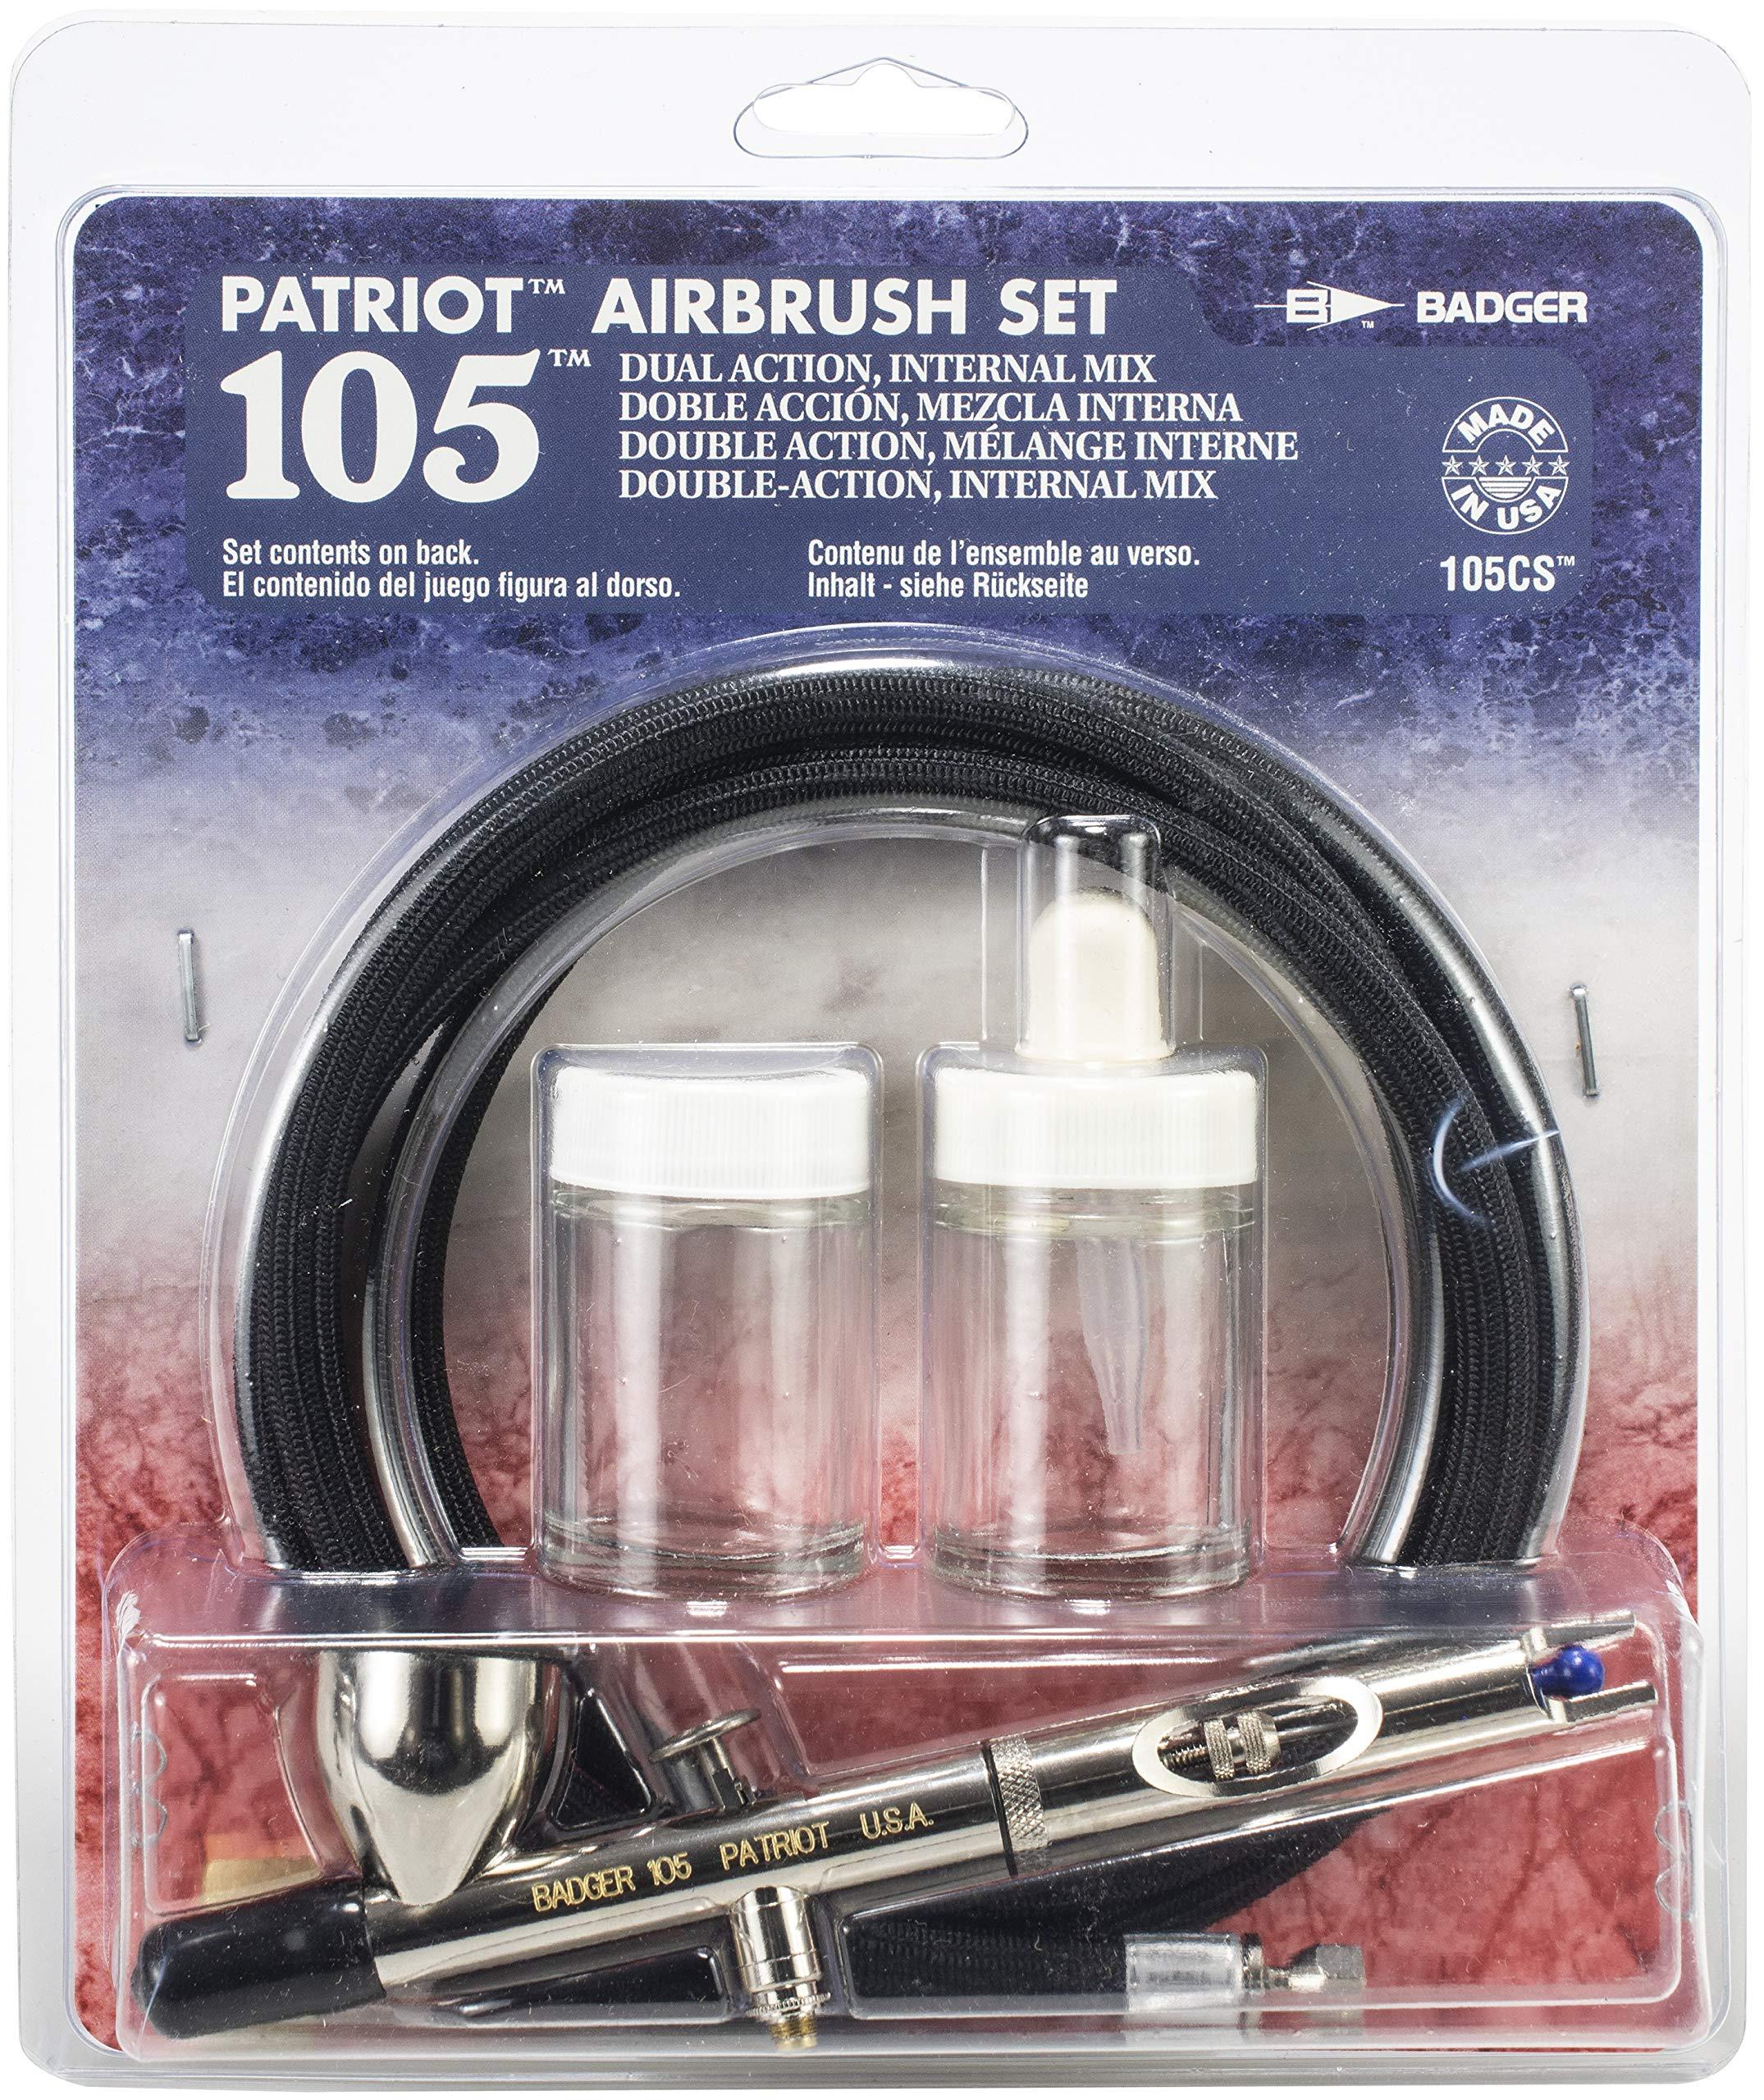 airbrush set patriot clam shell